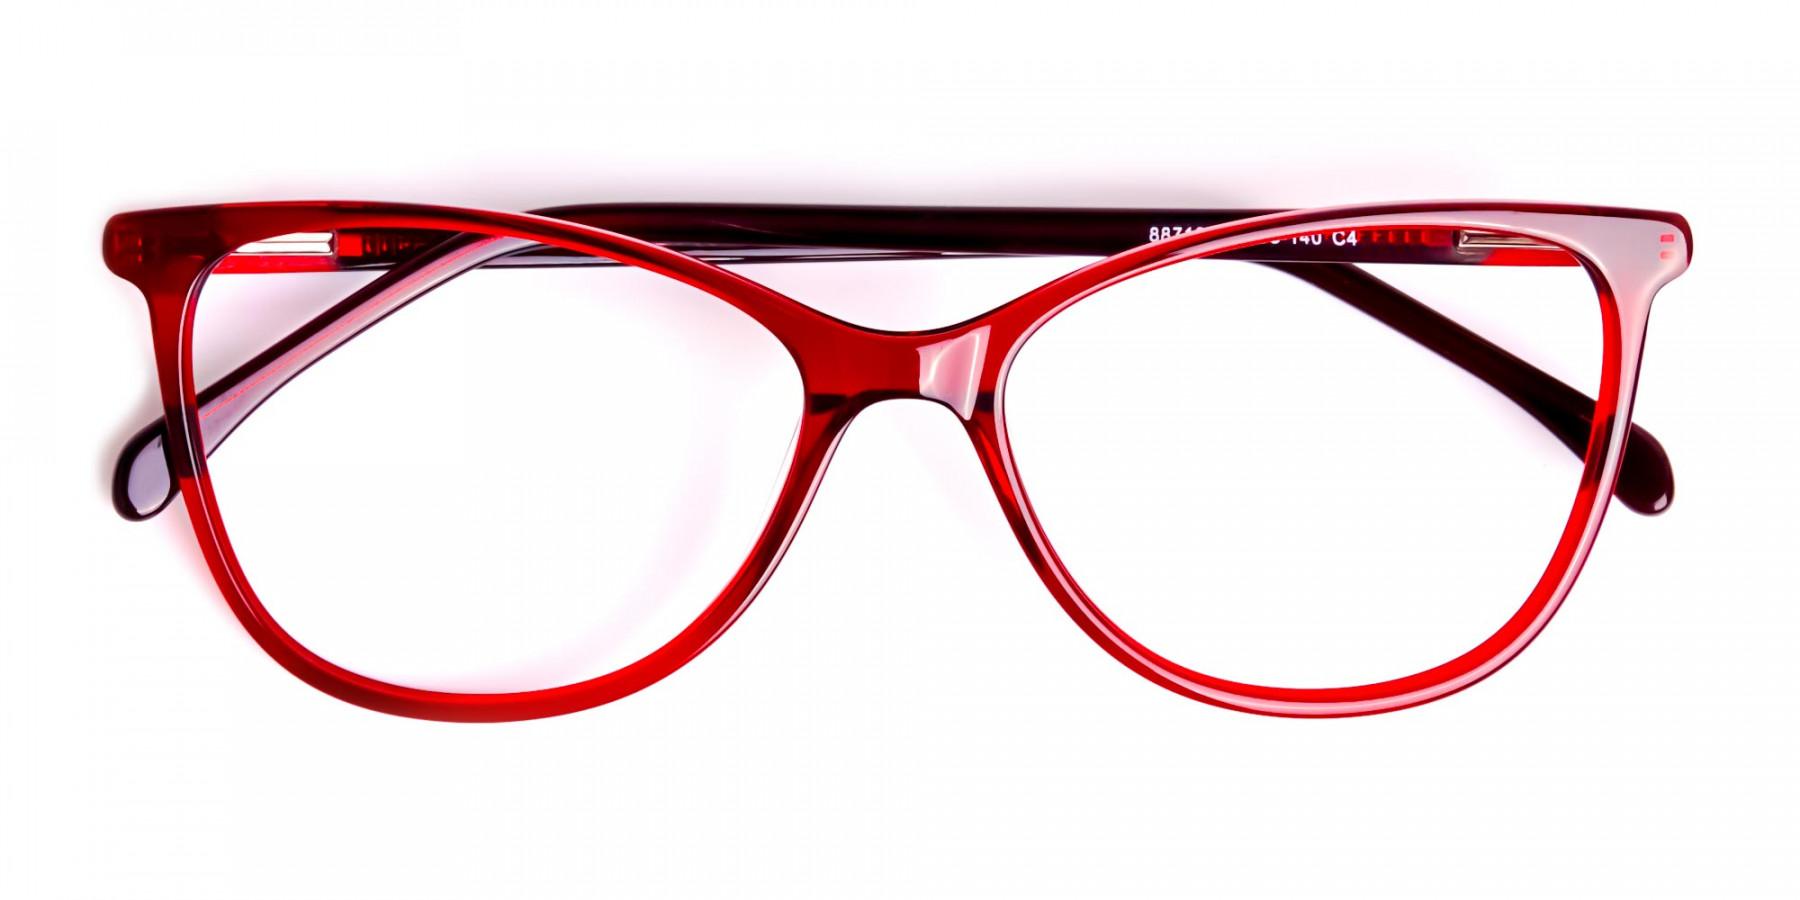 wine-red-translucent-cat-eye-glasses-1